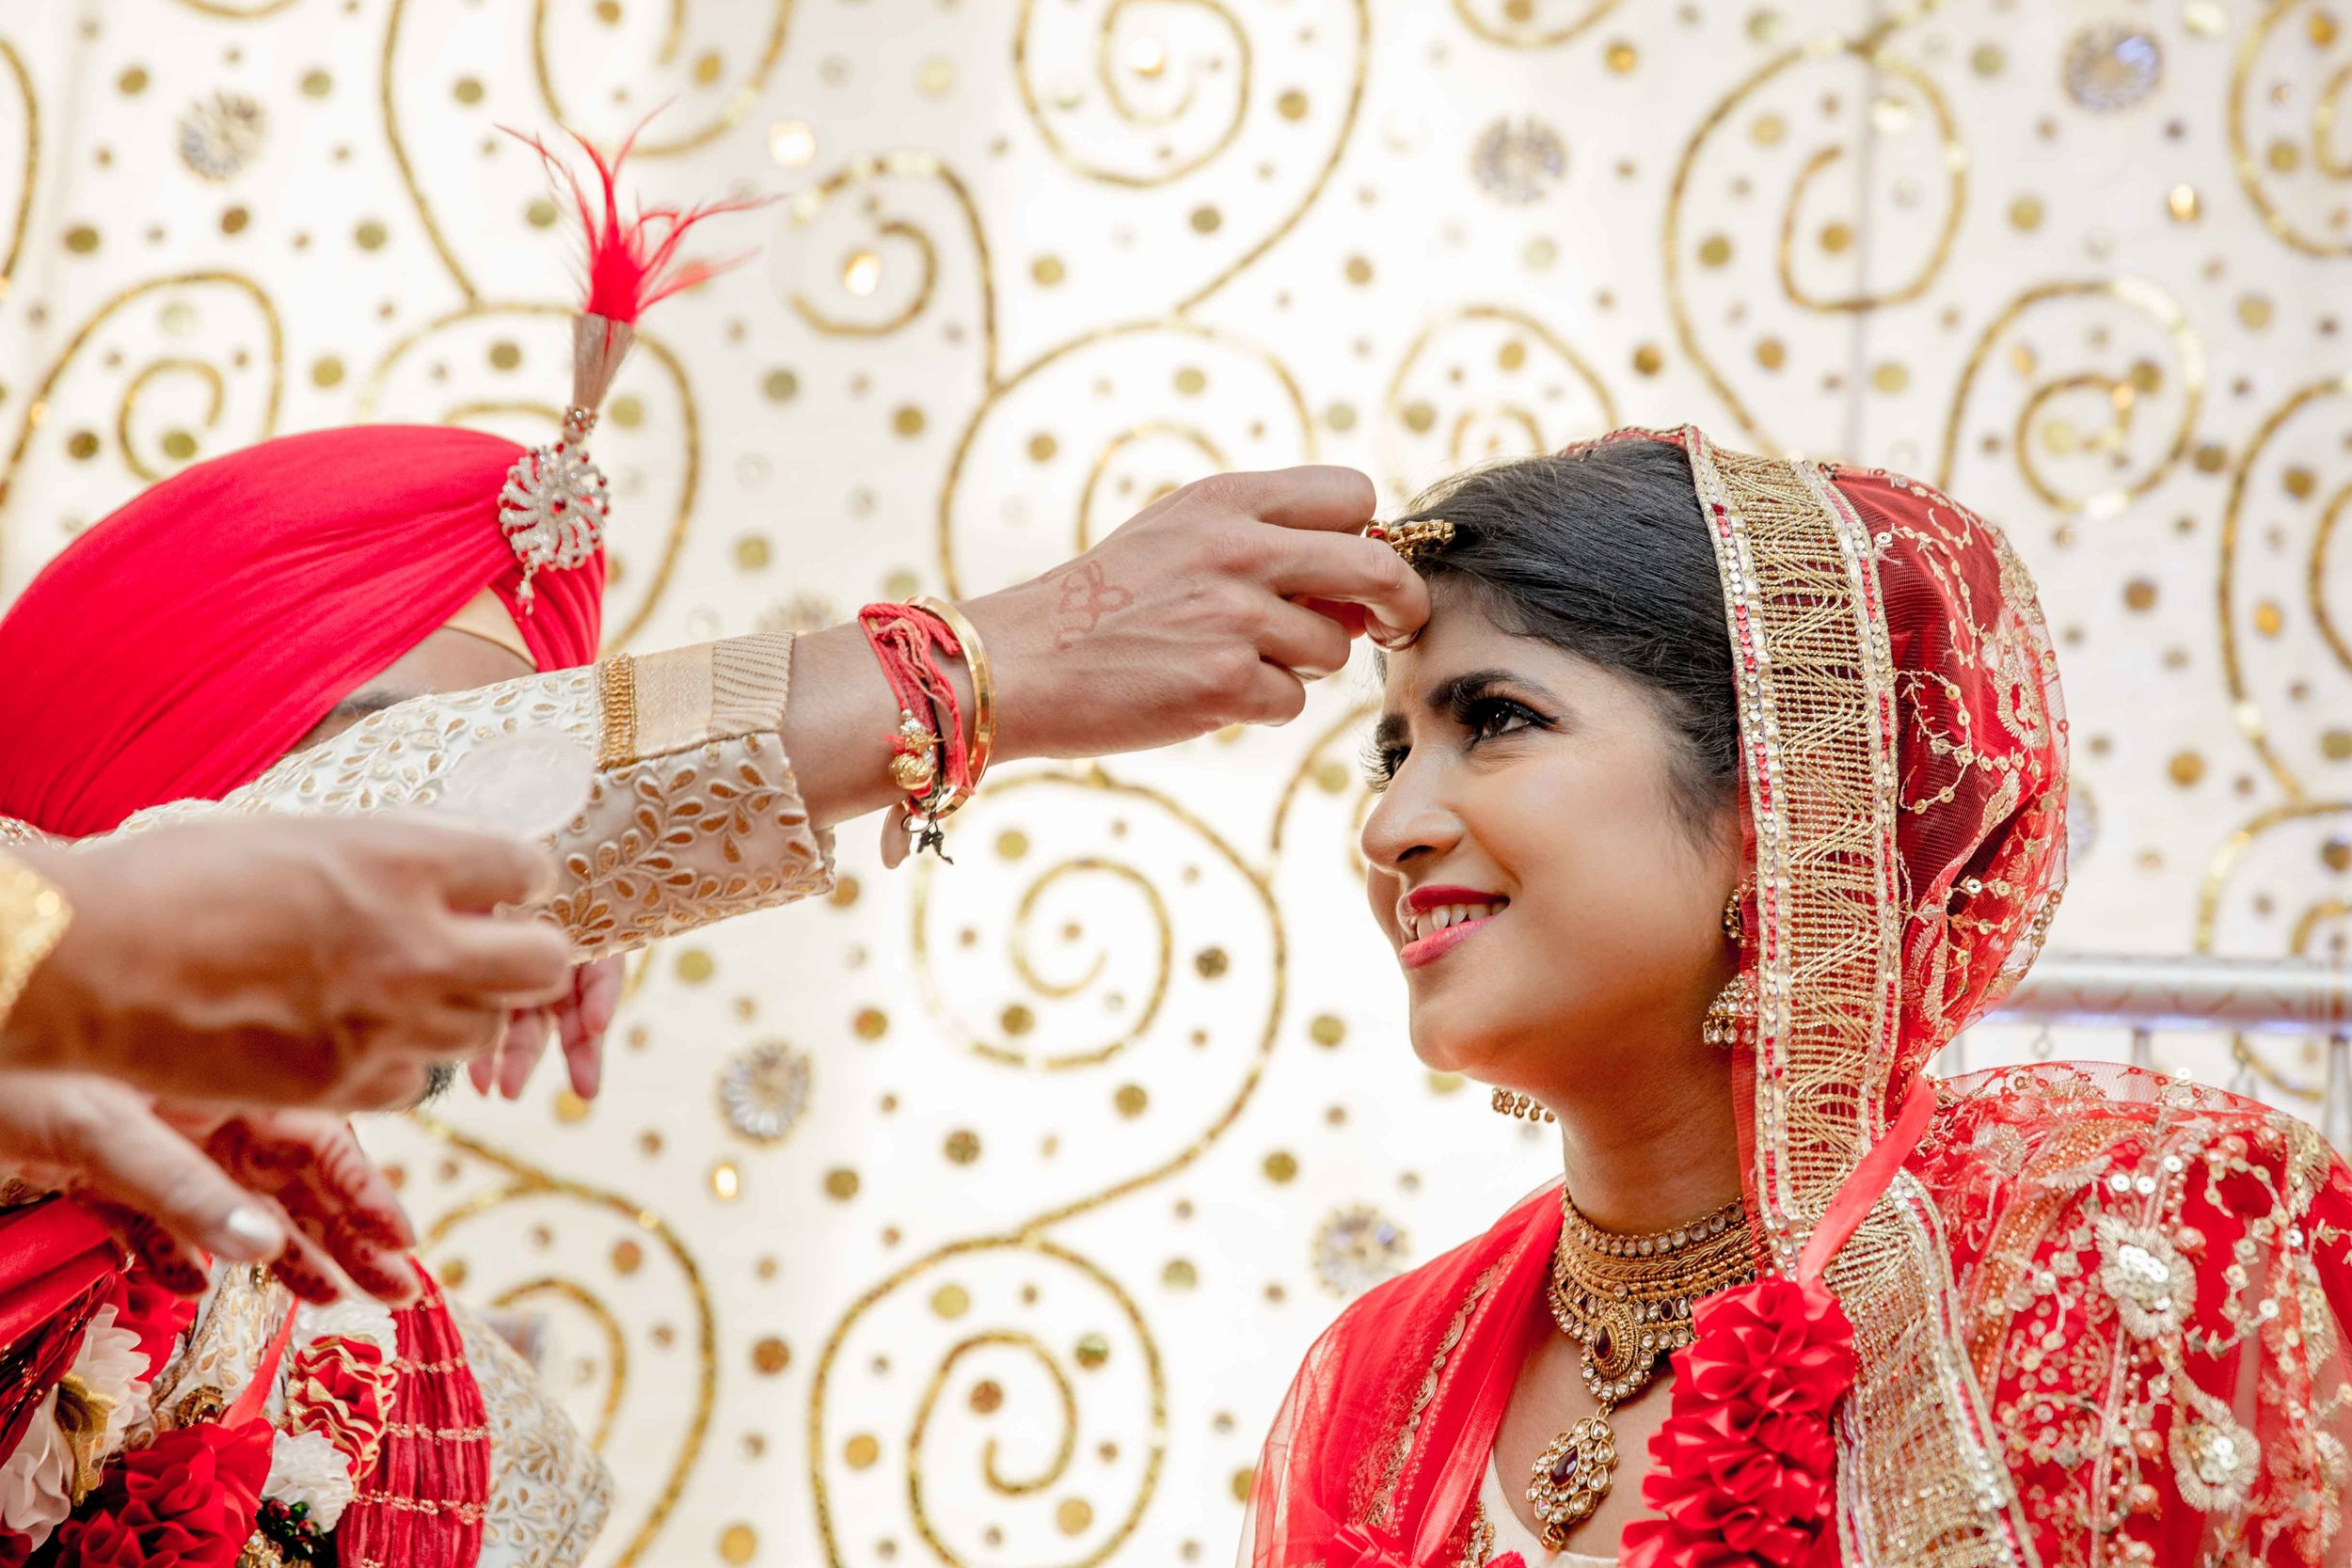 ramada-park-hall-hotel-birmingham-wolverhampton-hindu-wedding-asian-wedding-photography-natalia-smith-photography-27.jpg